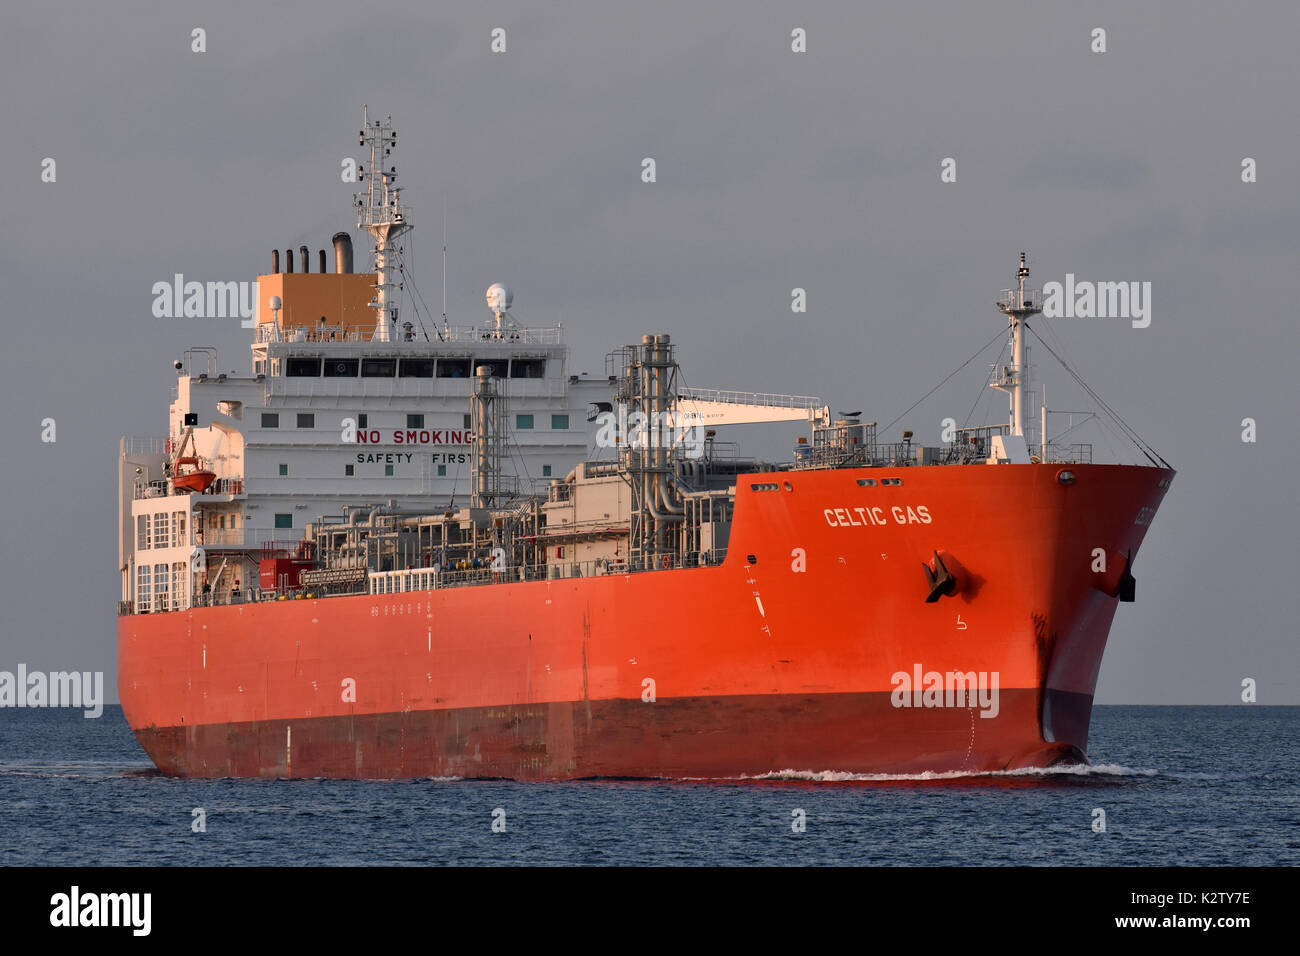 Celtic Gas - Stock Image